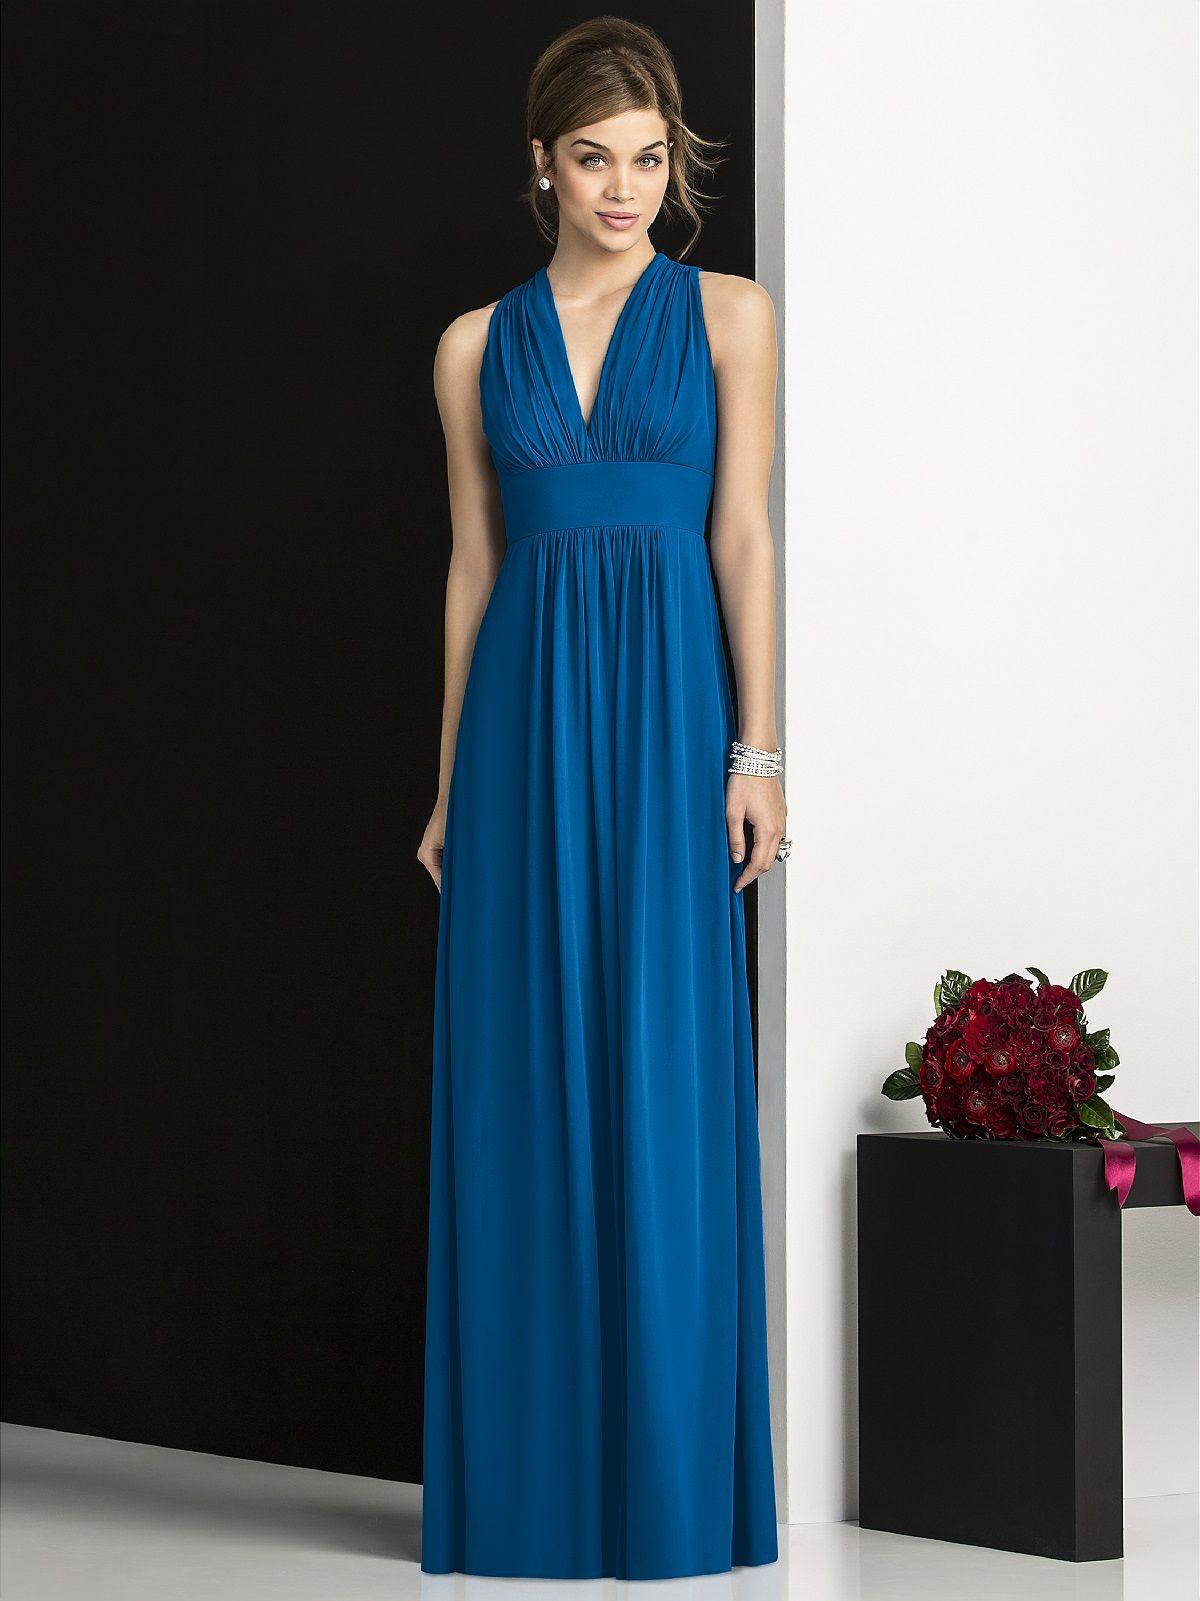 After Six Bridesmaids Style 6680 | Dress ideas, Flower girl dresses ...